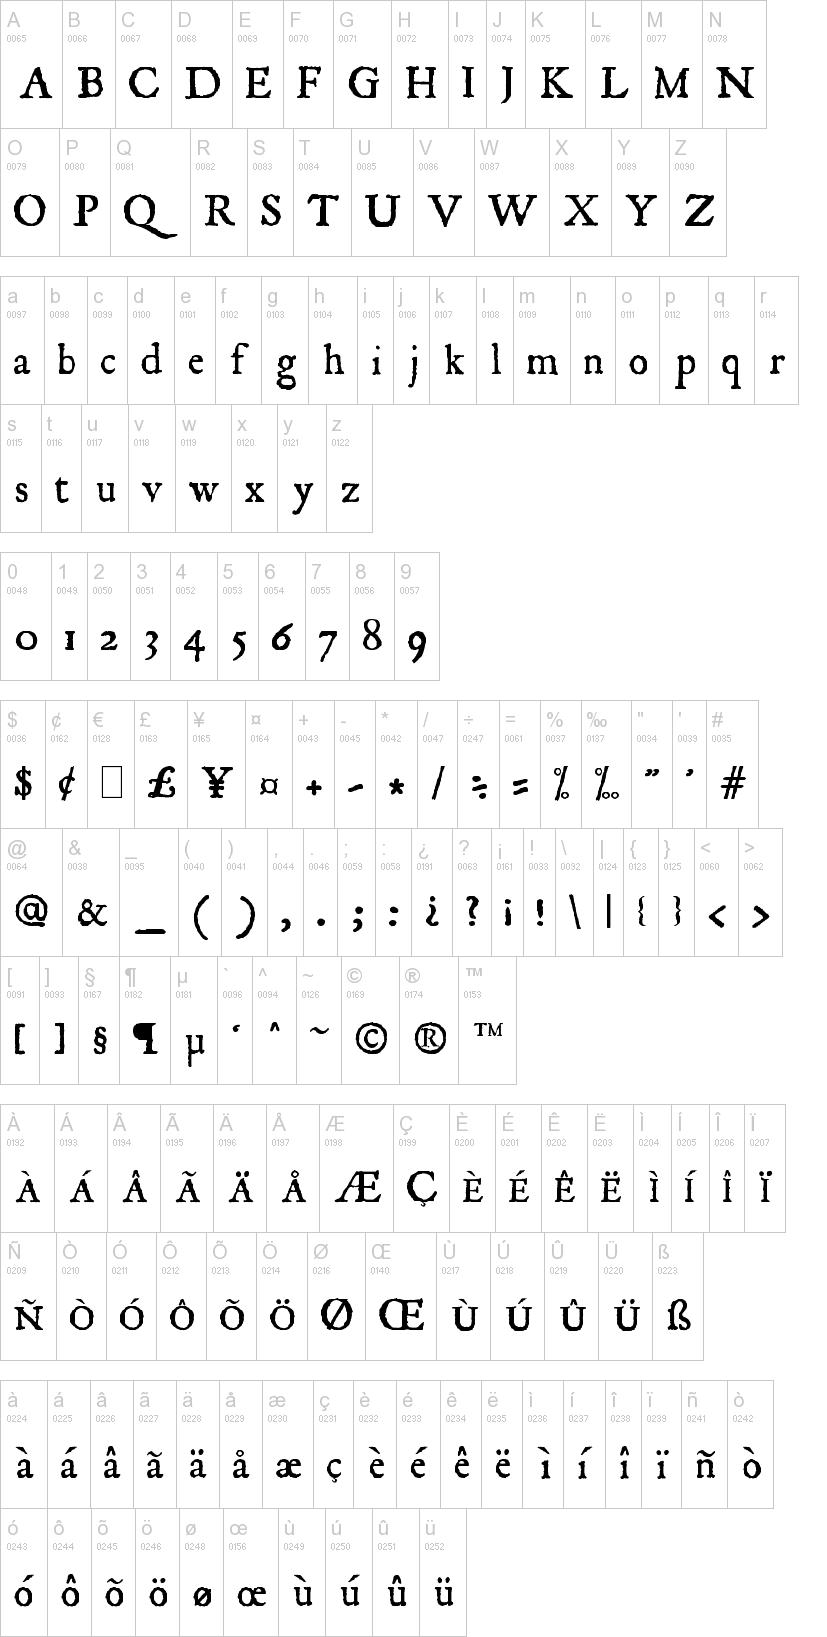 Jslancient Font Good For Scrapbooking Pirates Of The Caribbean